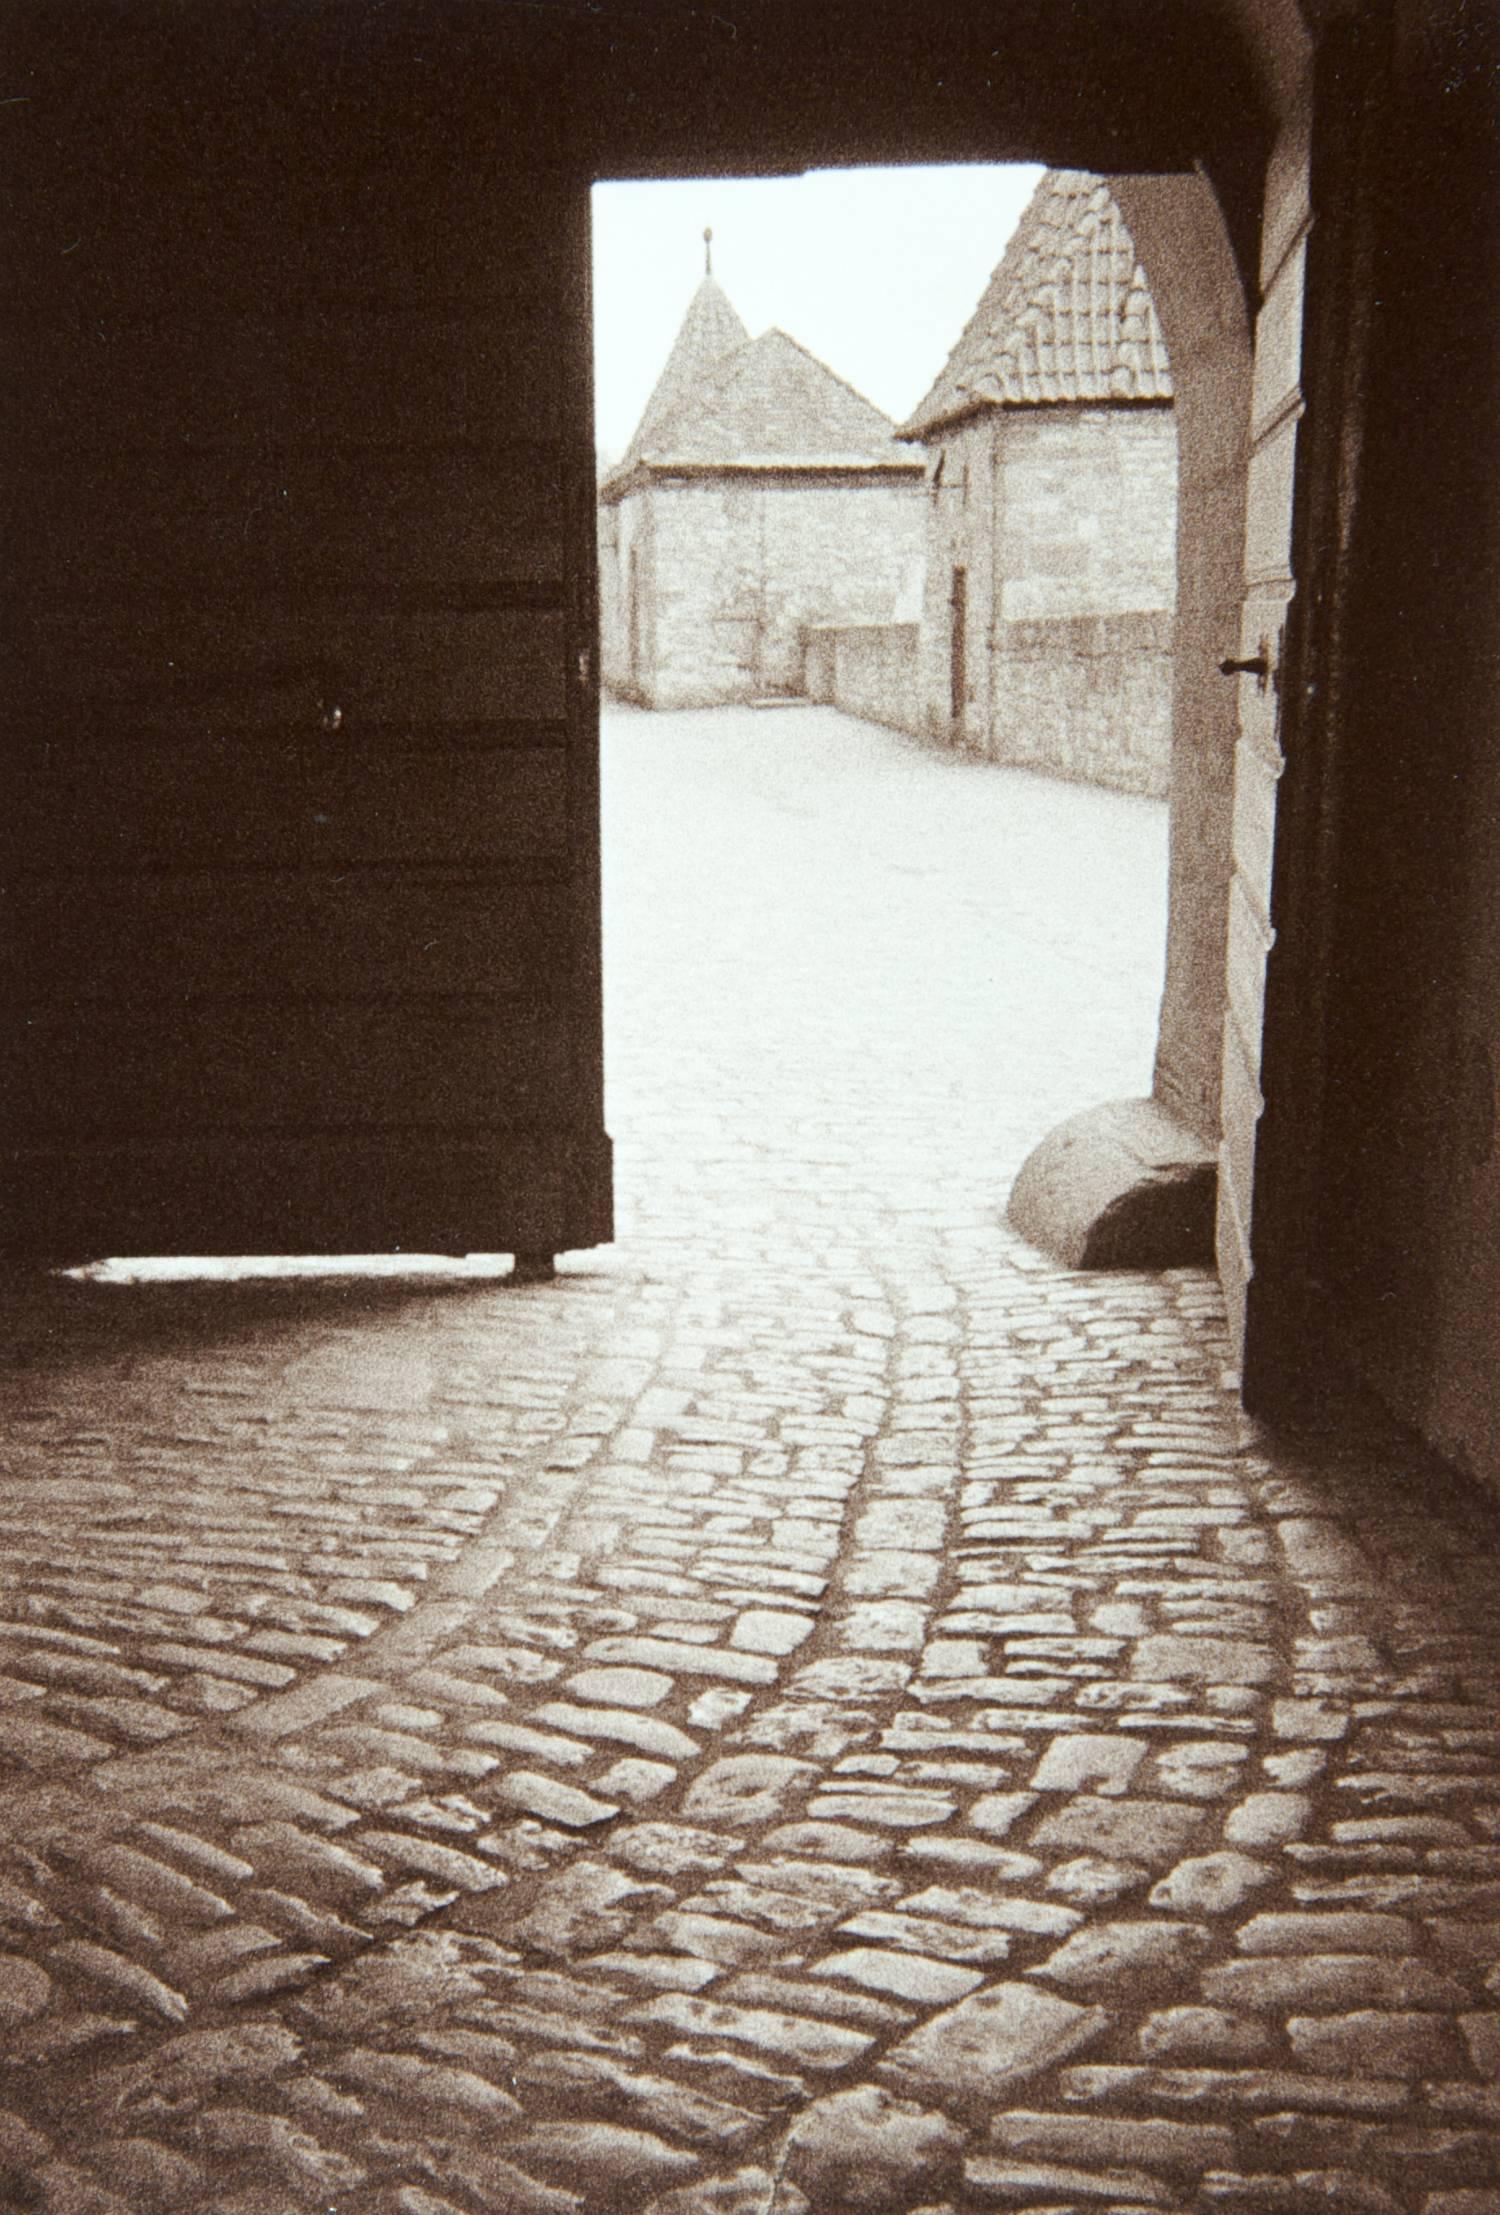 Doorway (Würzburg, Germany)